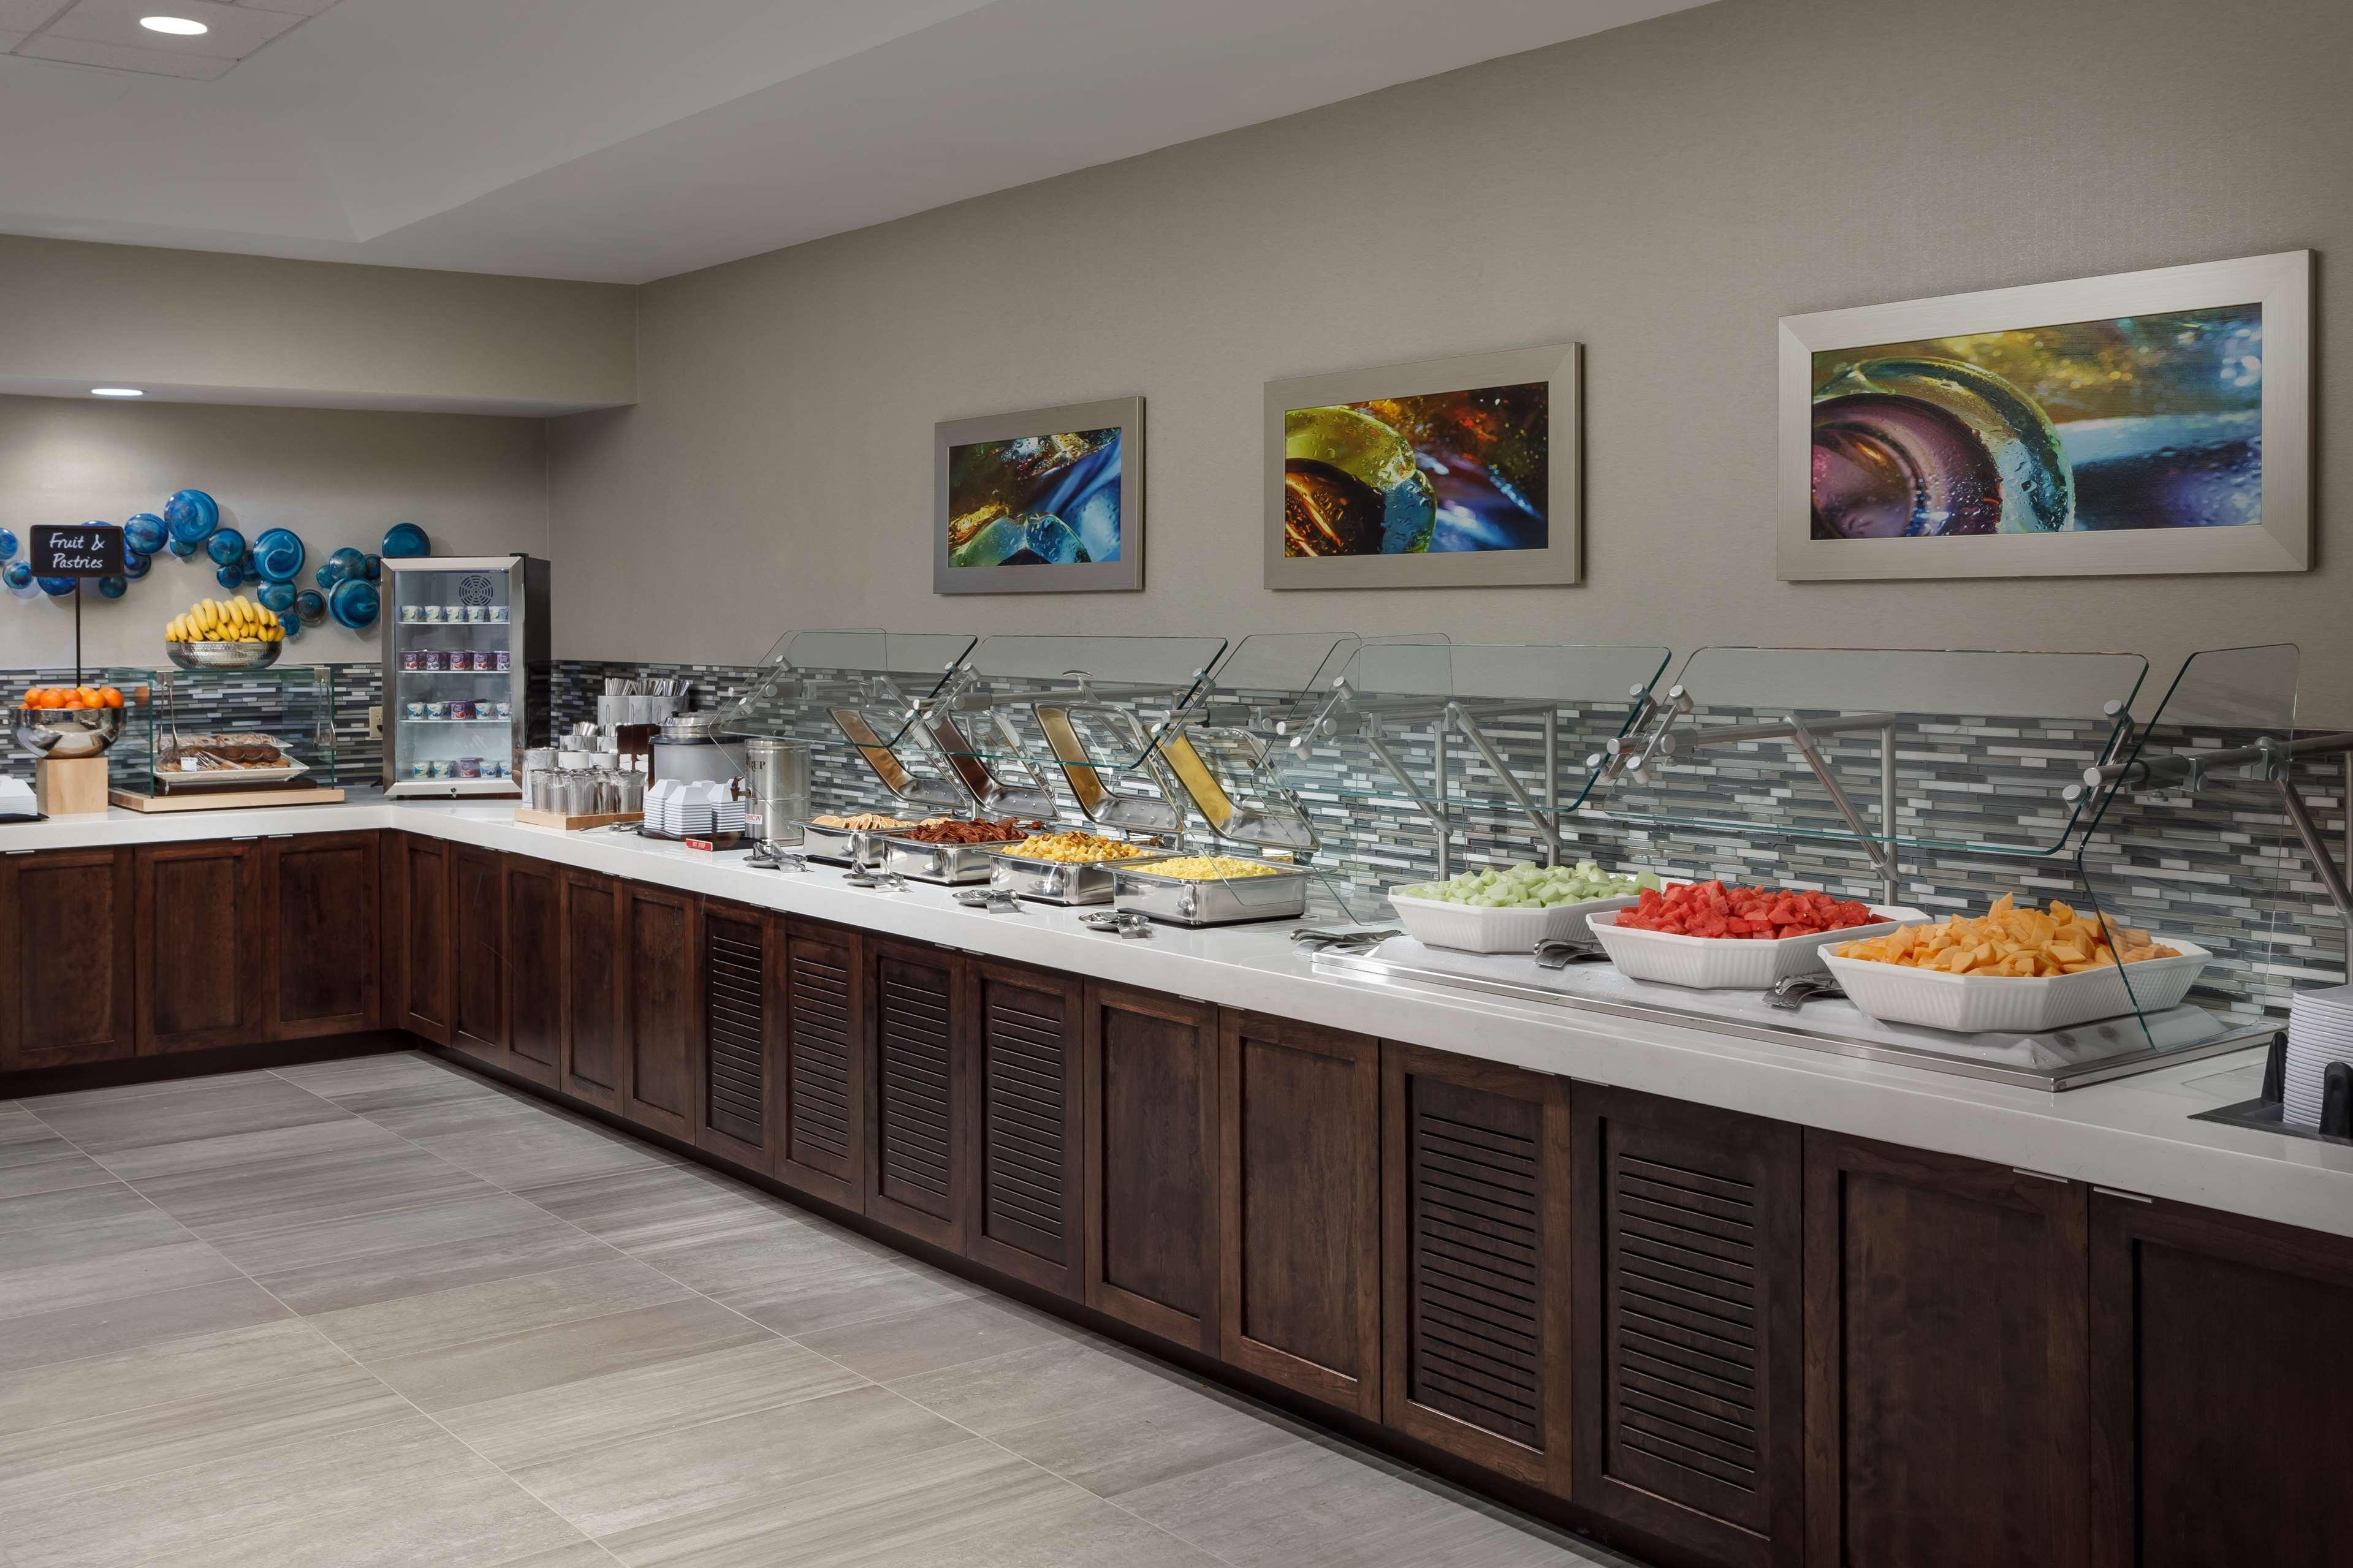 Embassy Suites by Hilton Orlando Lake Buena Vista Resort image 11